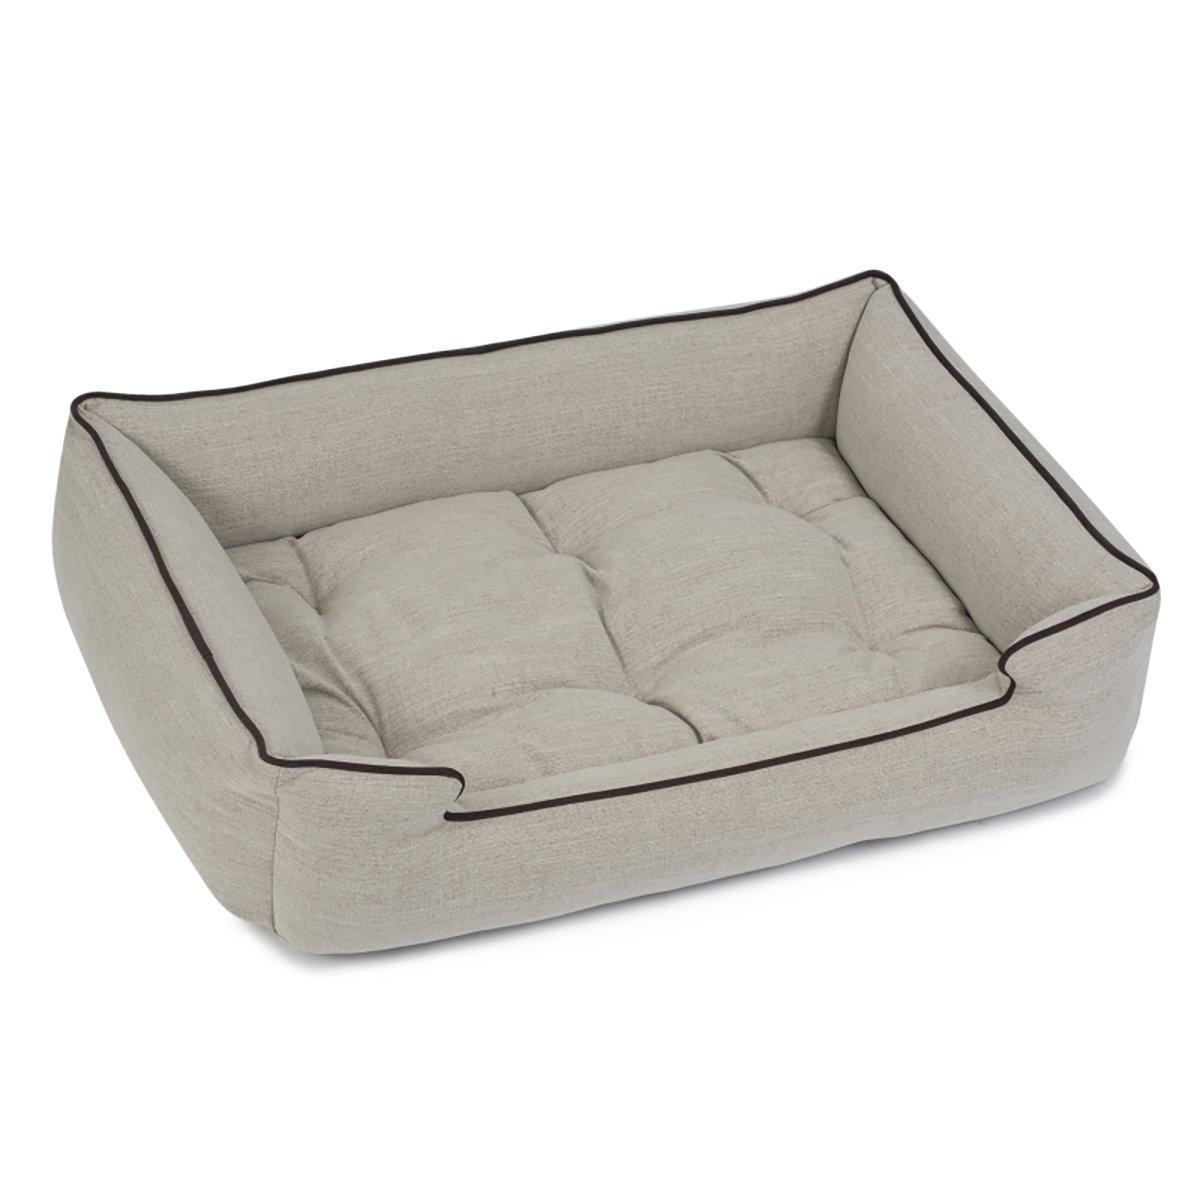 Jax and Bones Standard Textured Linen Sleeper Bed, Small, Windsor Linen